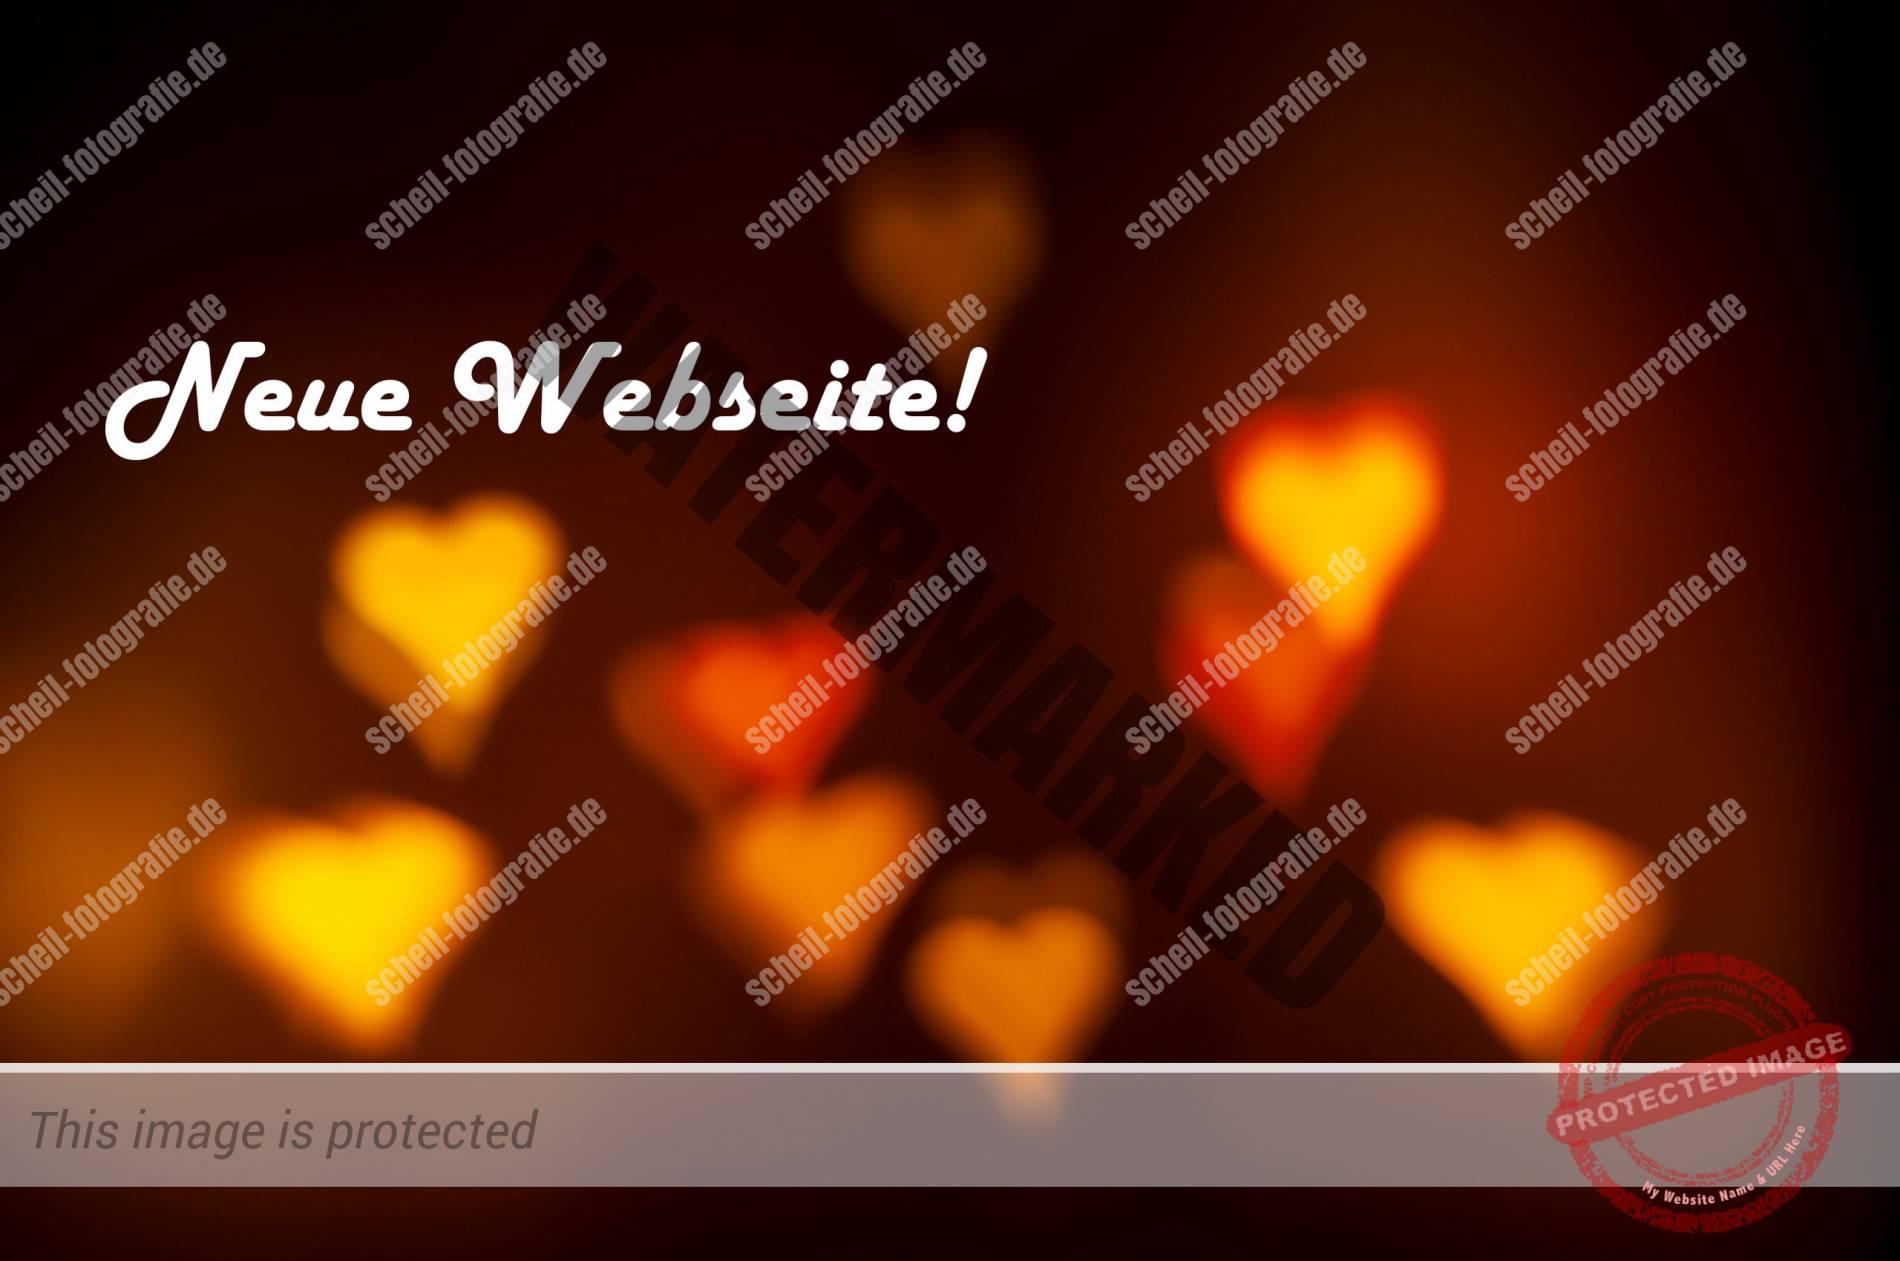 Neues Homepage-Design